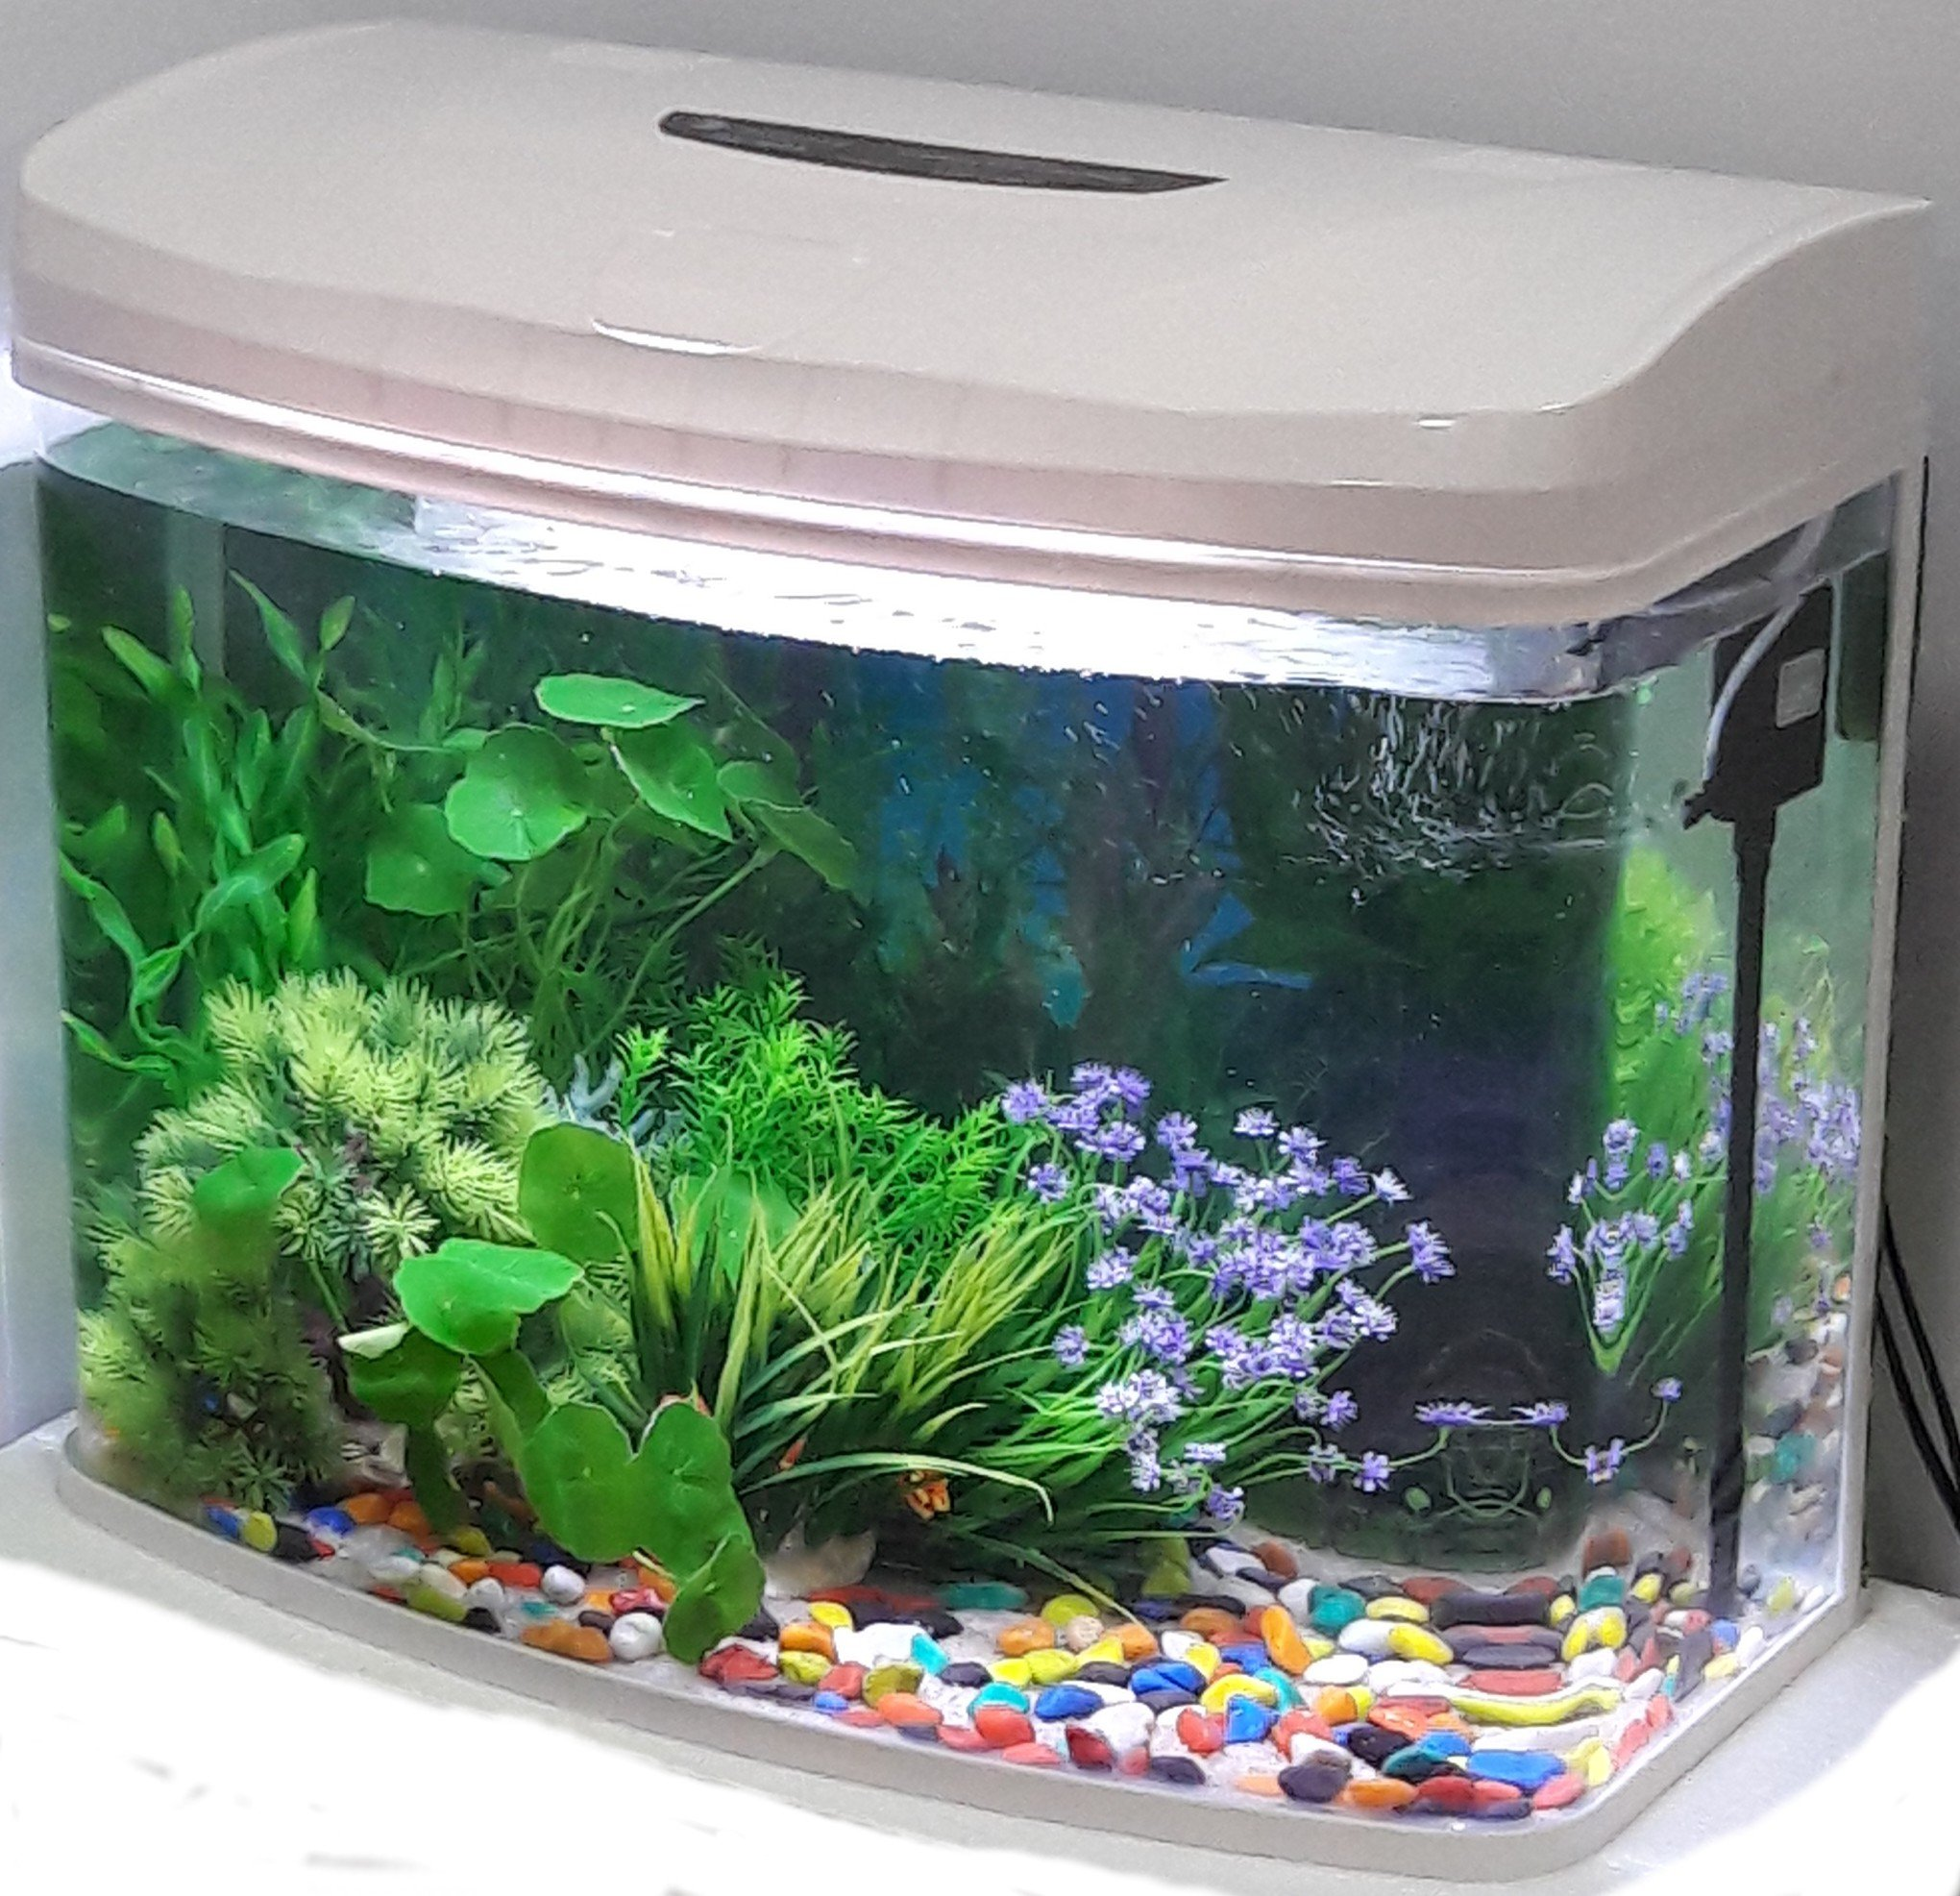 Rs Moulded Glass Aquarium 70l Black Buy Online In India At Desertcart Productid 70043103